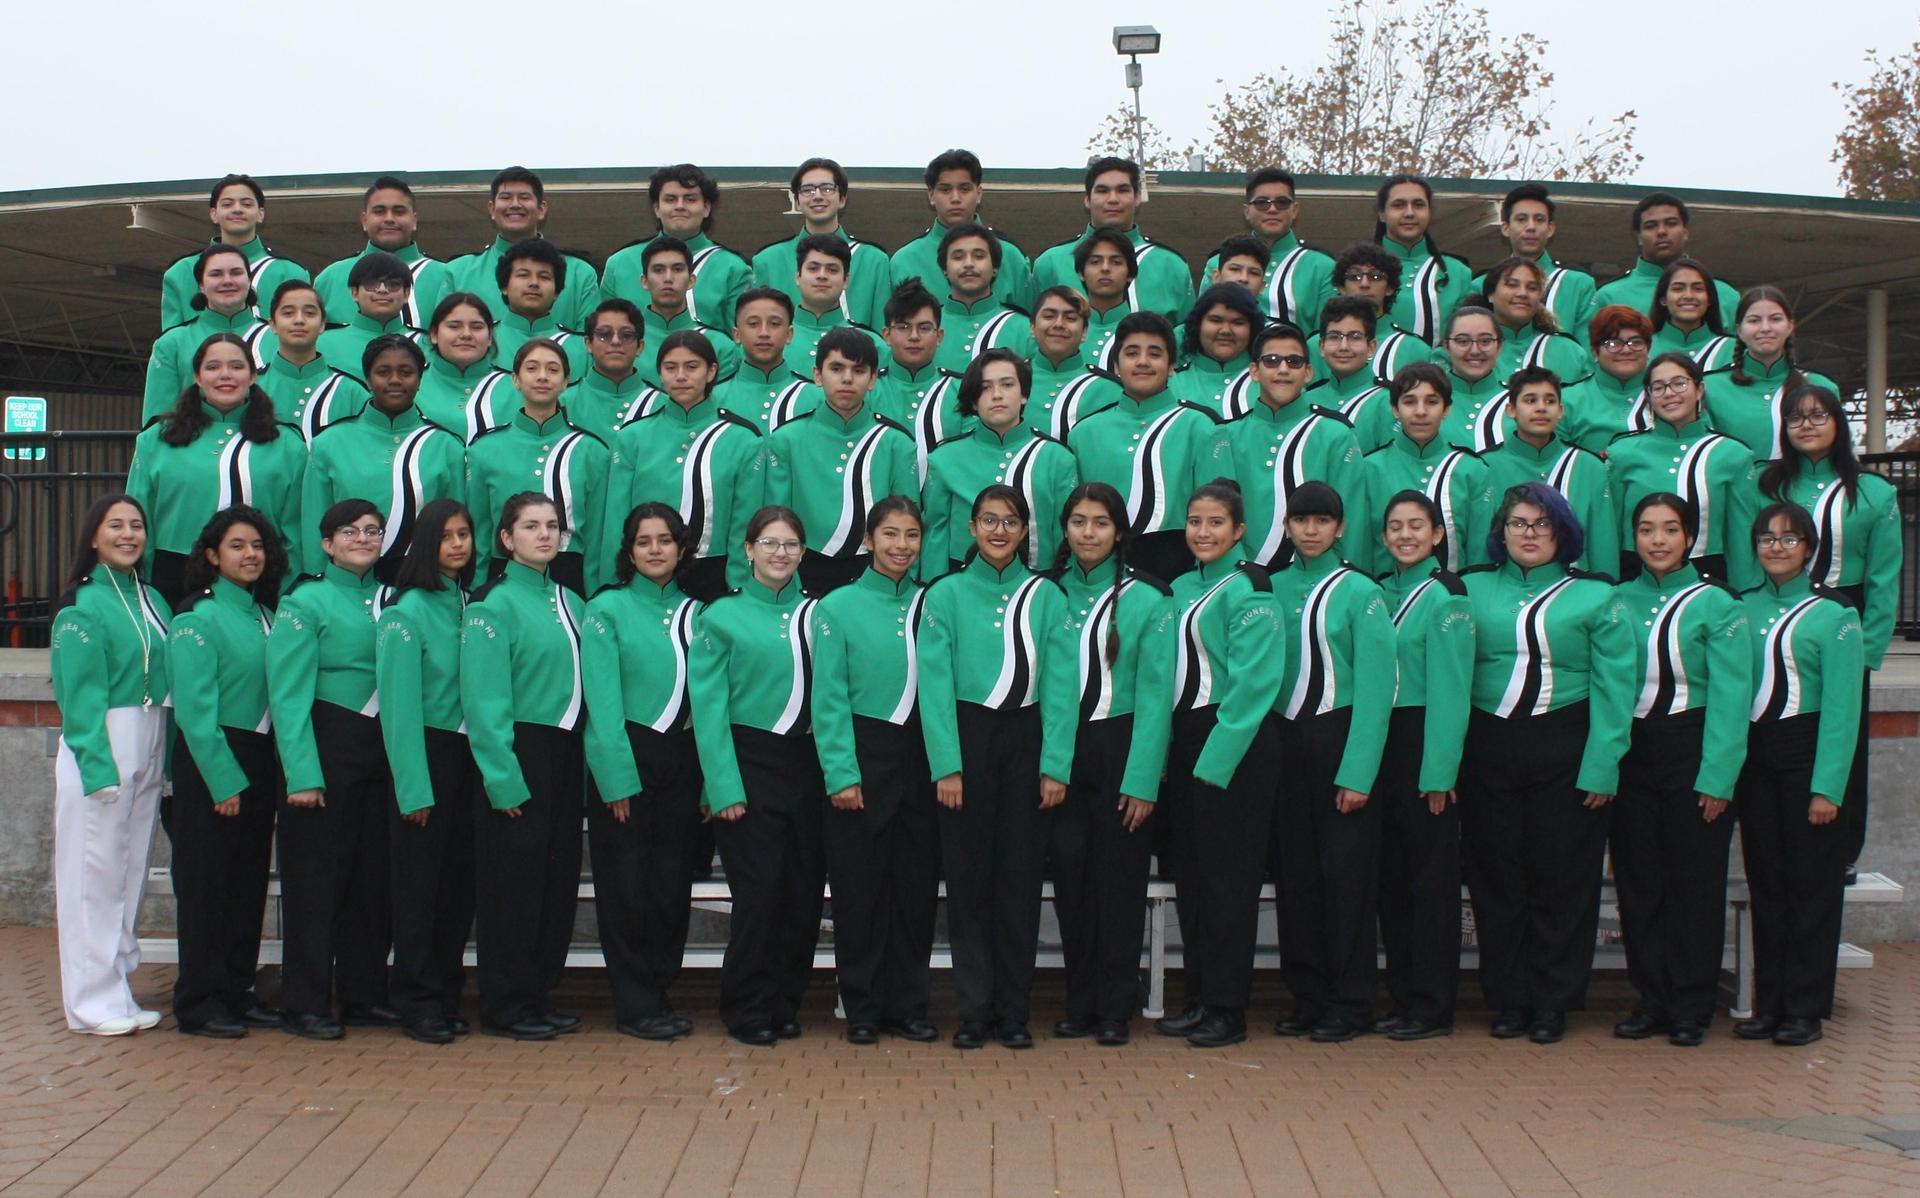 Pioneer Band 2019-20